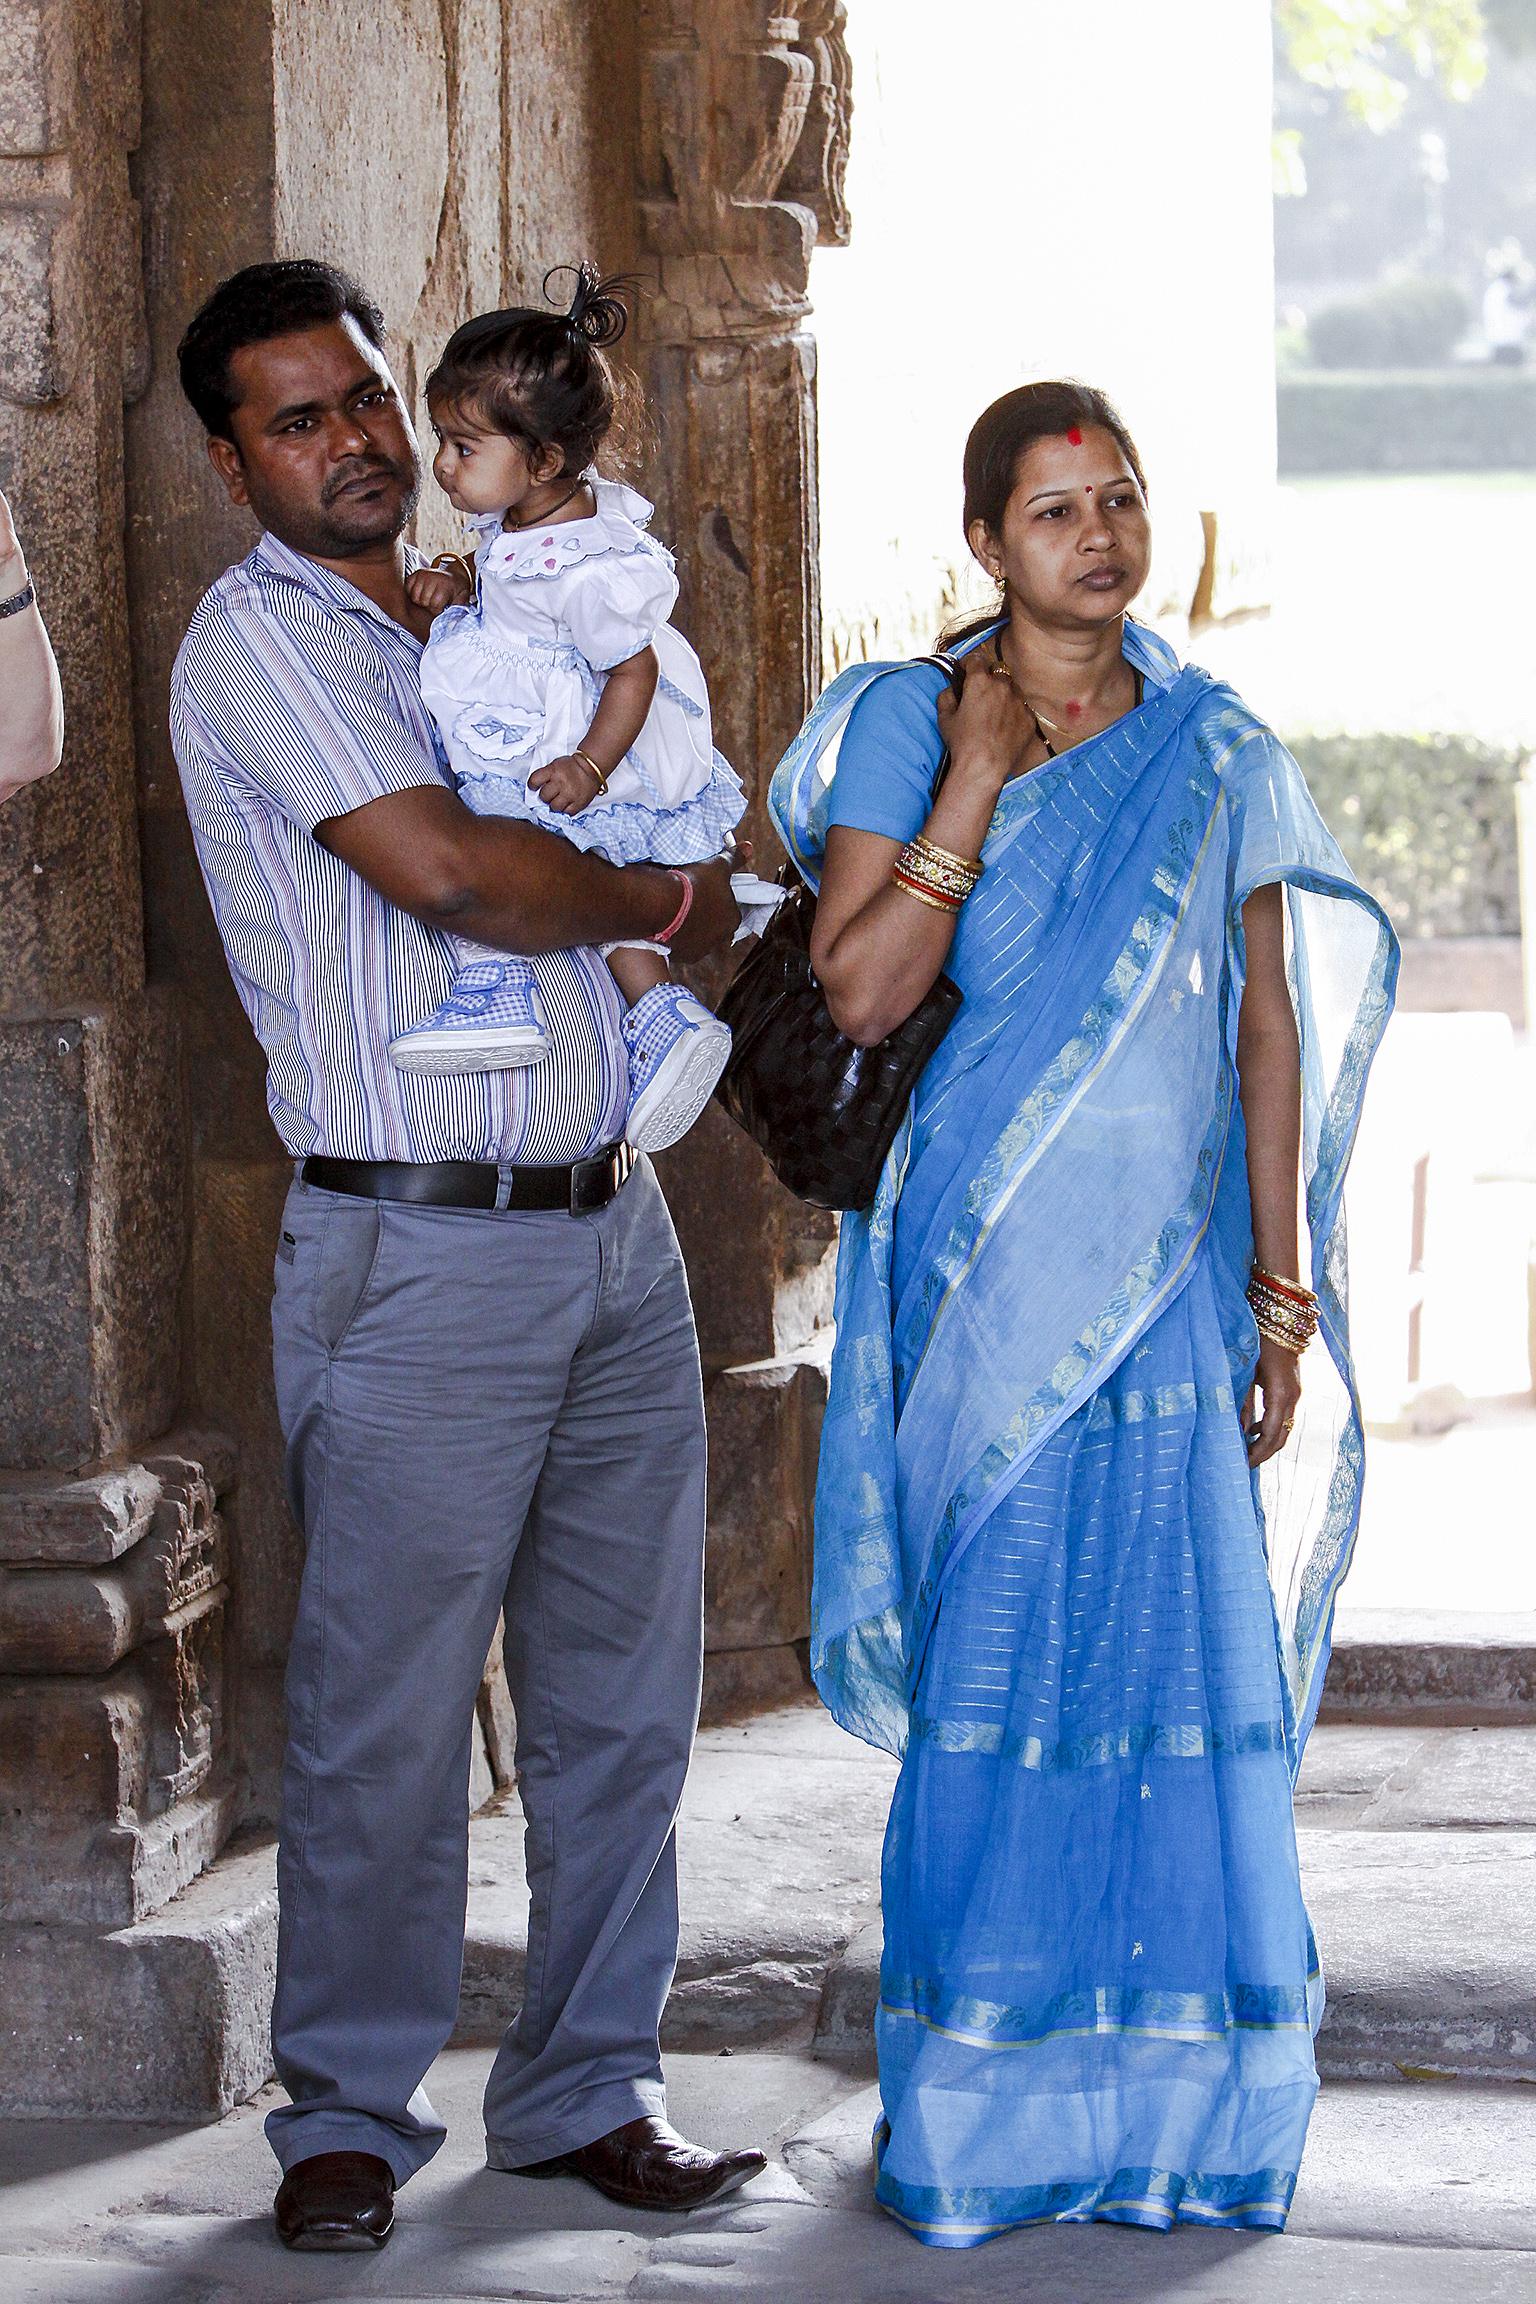 portraits-indien-inde-rajasthan-2010-marie-colette-becker-12